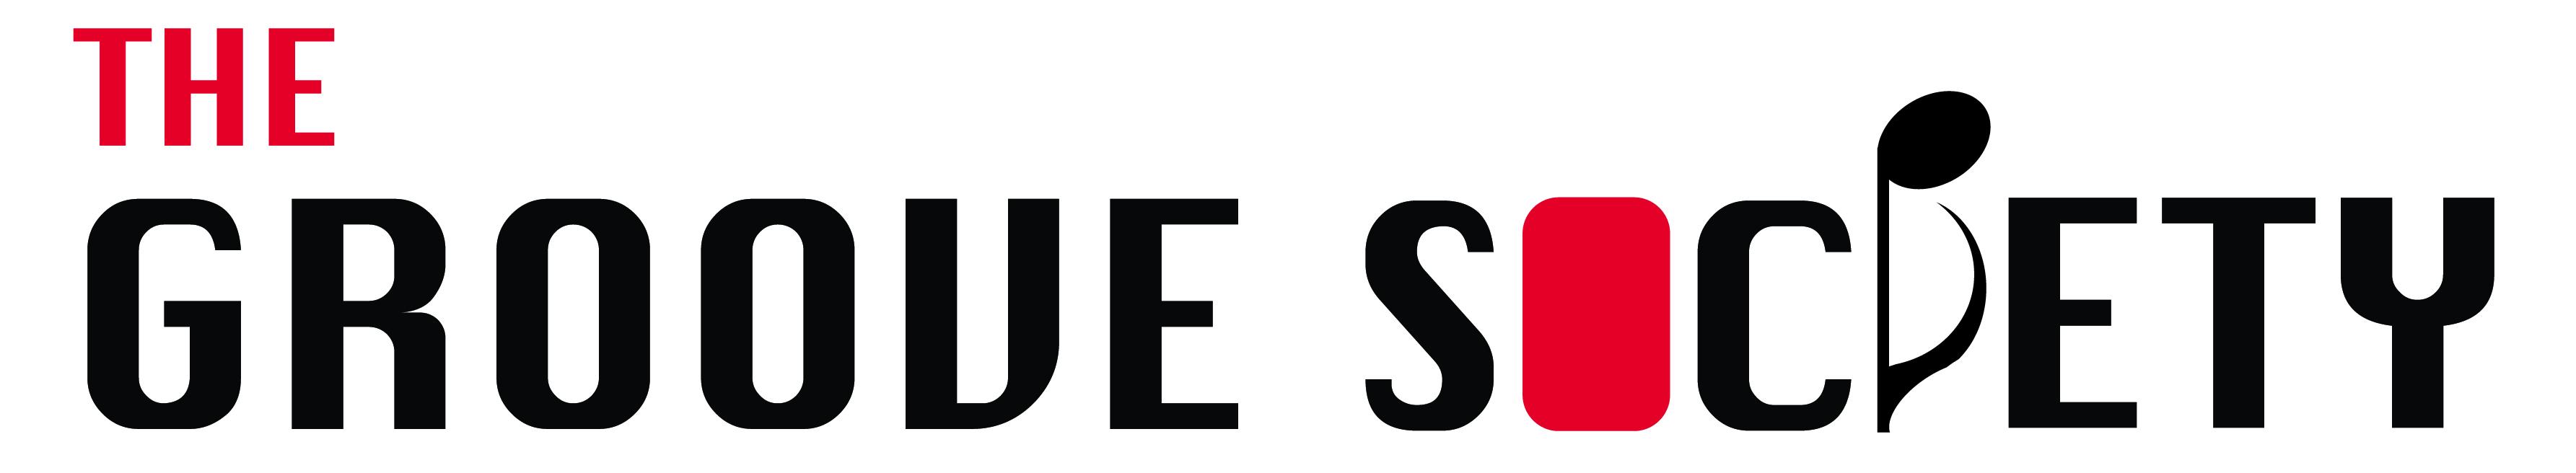 Groove Society Logo.jpg